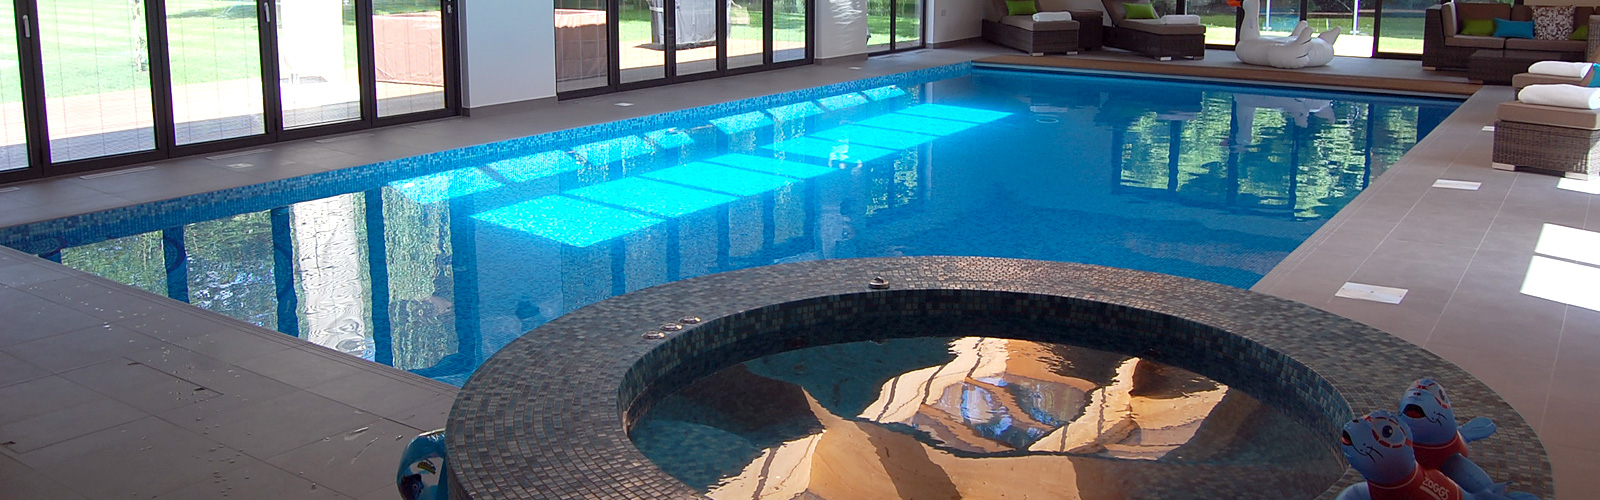 Indoor Swimming Pools Buckland Pool Reigate Surrey